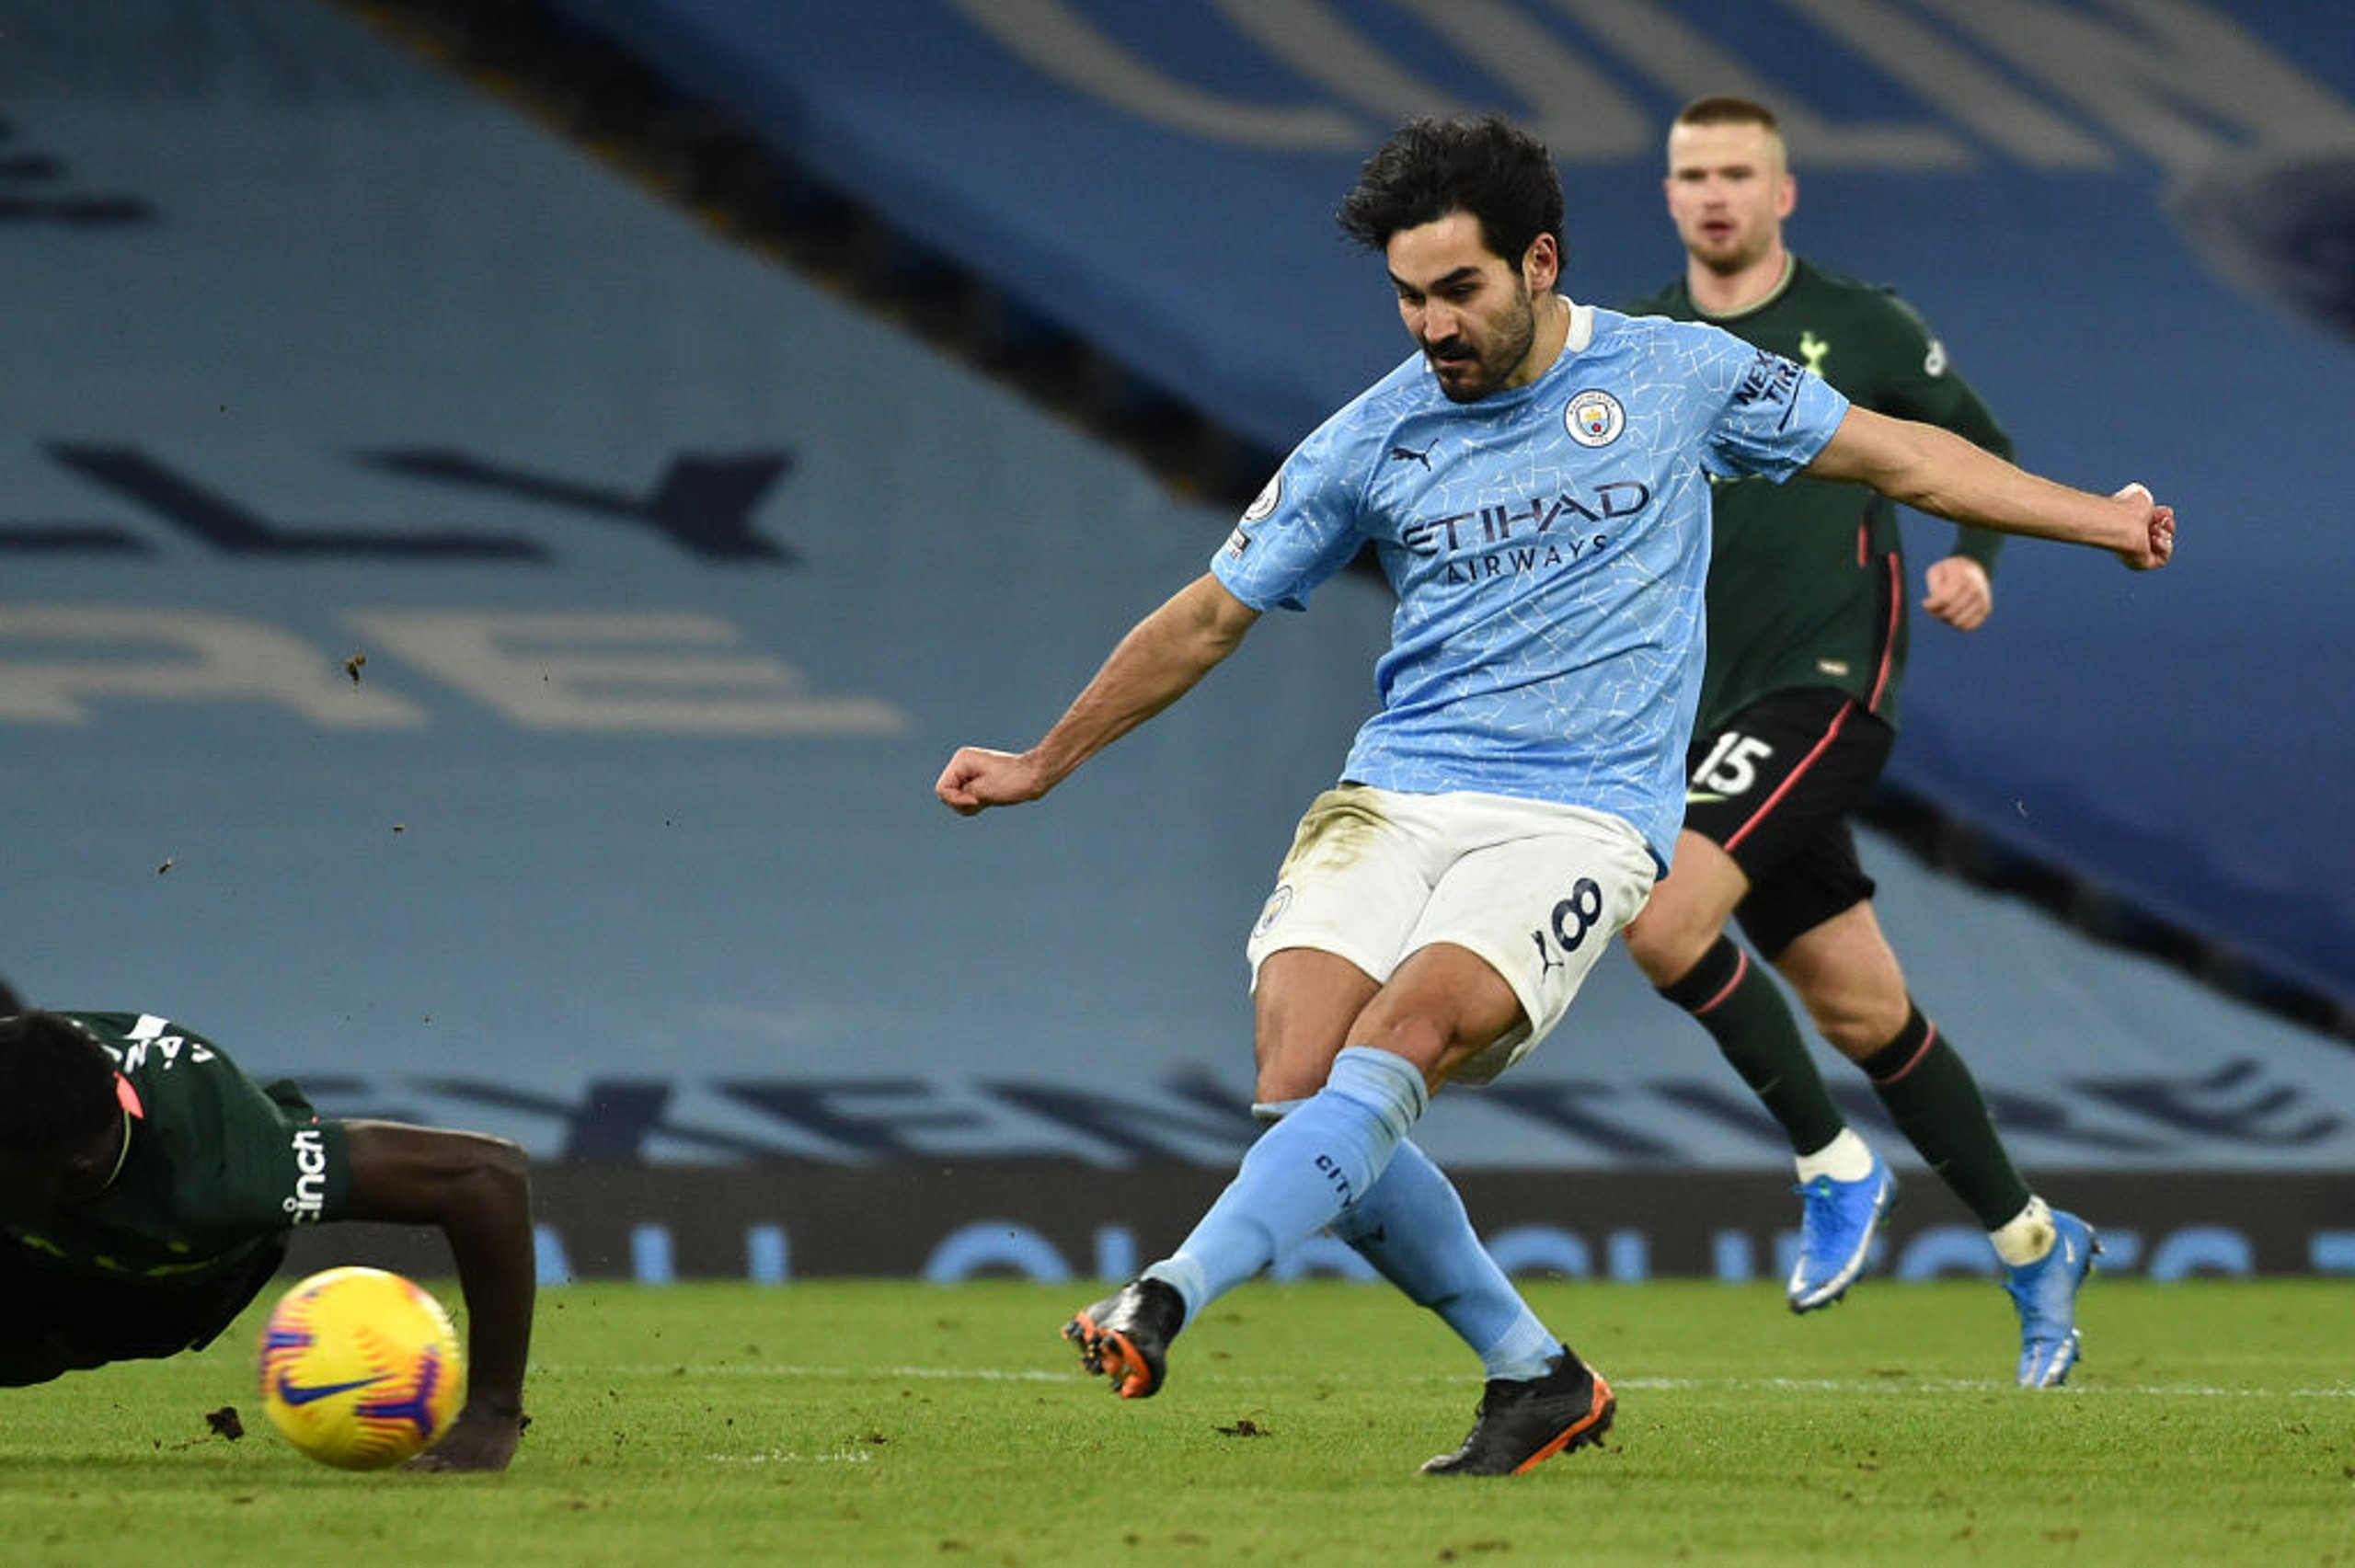 Gallery: Gundogan stars as City see off Spurs